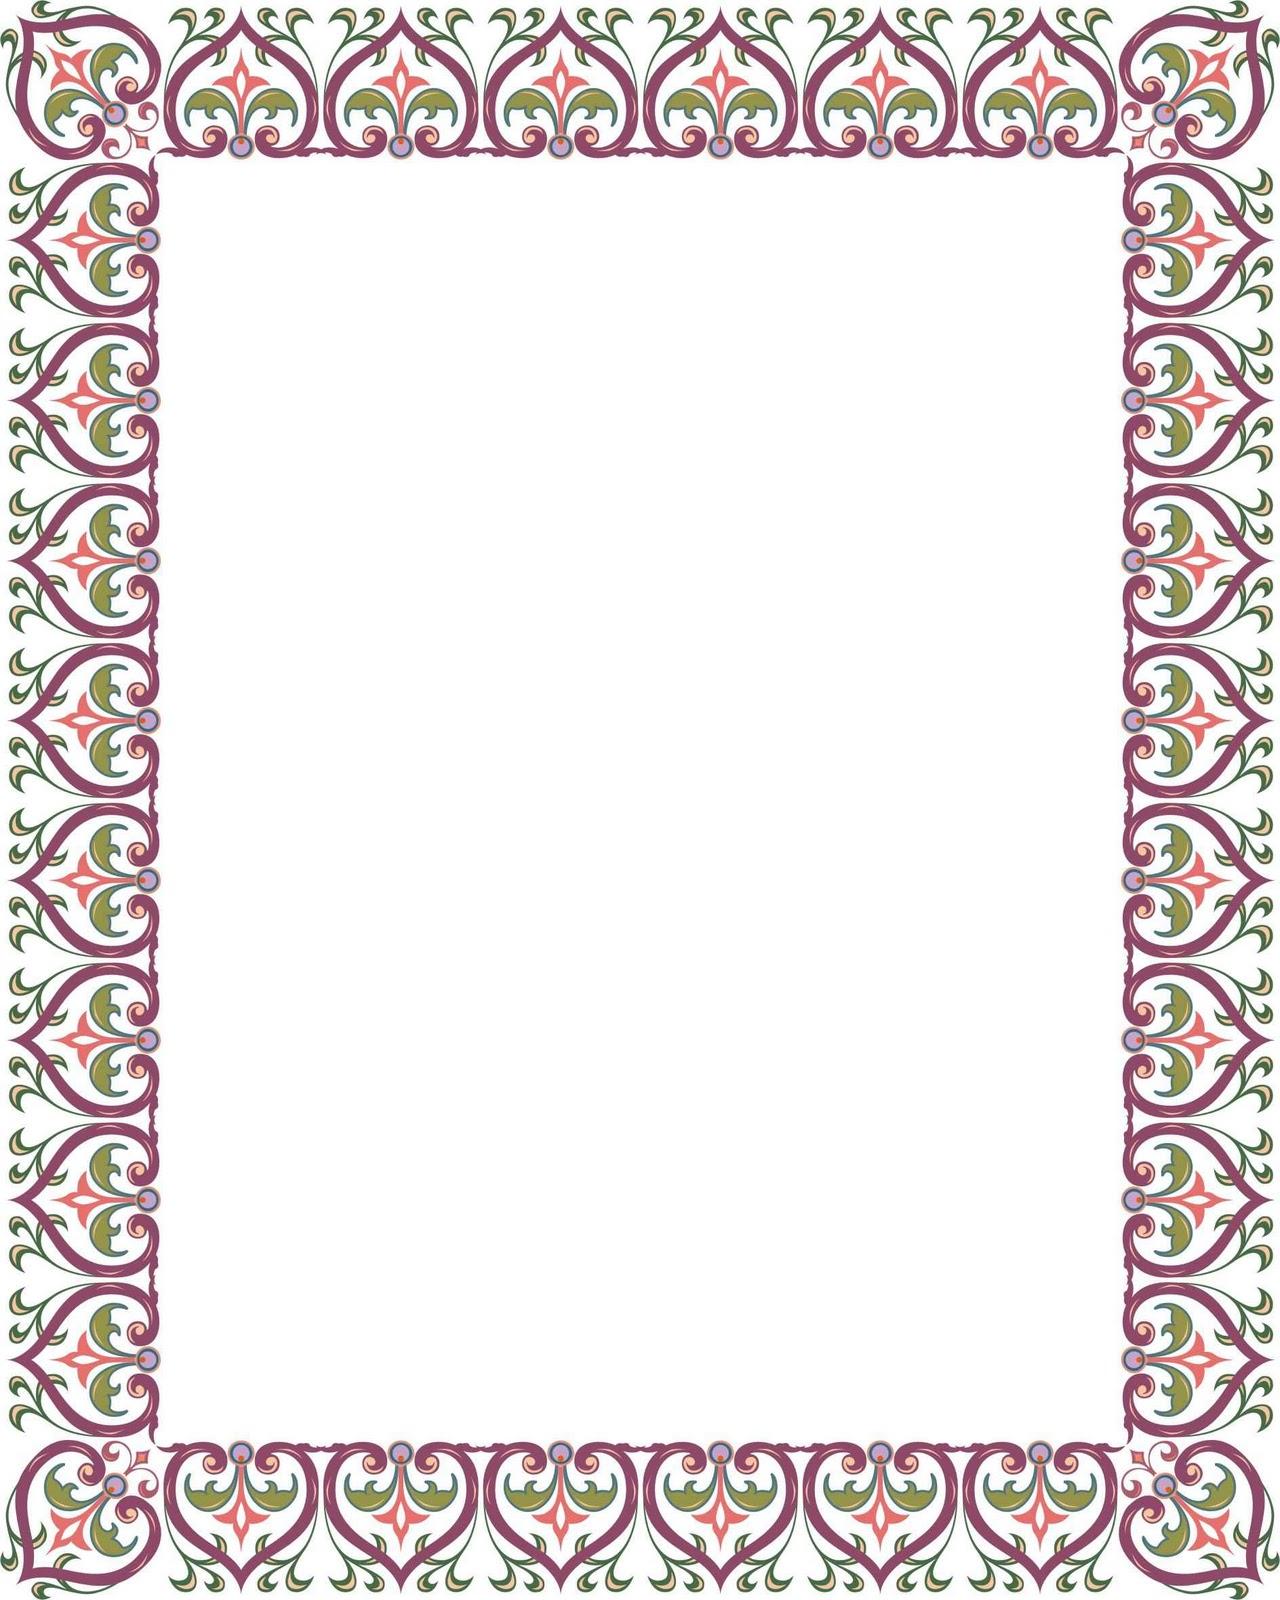 Bingkai / Border Piagam Vector (2)